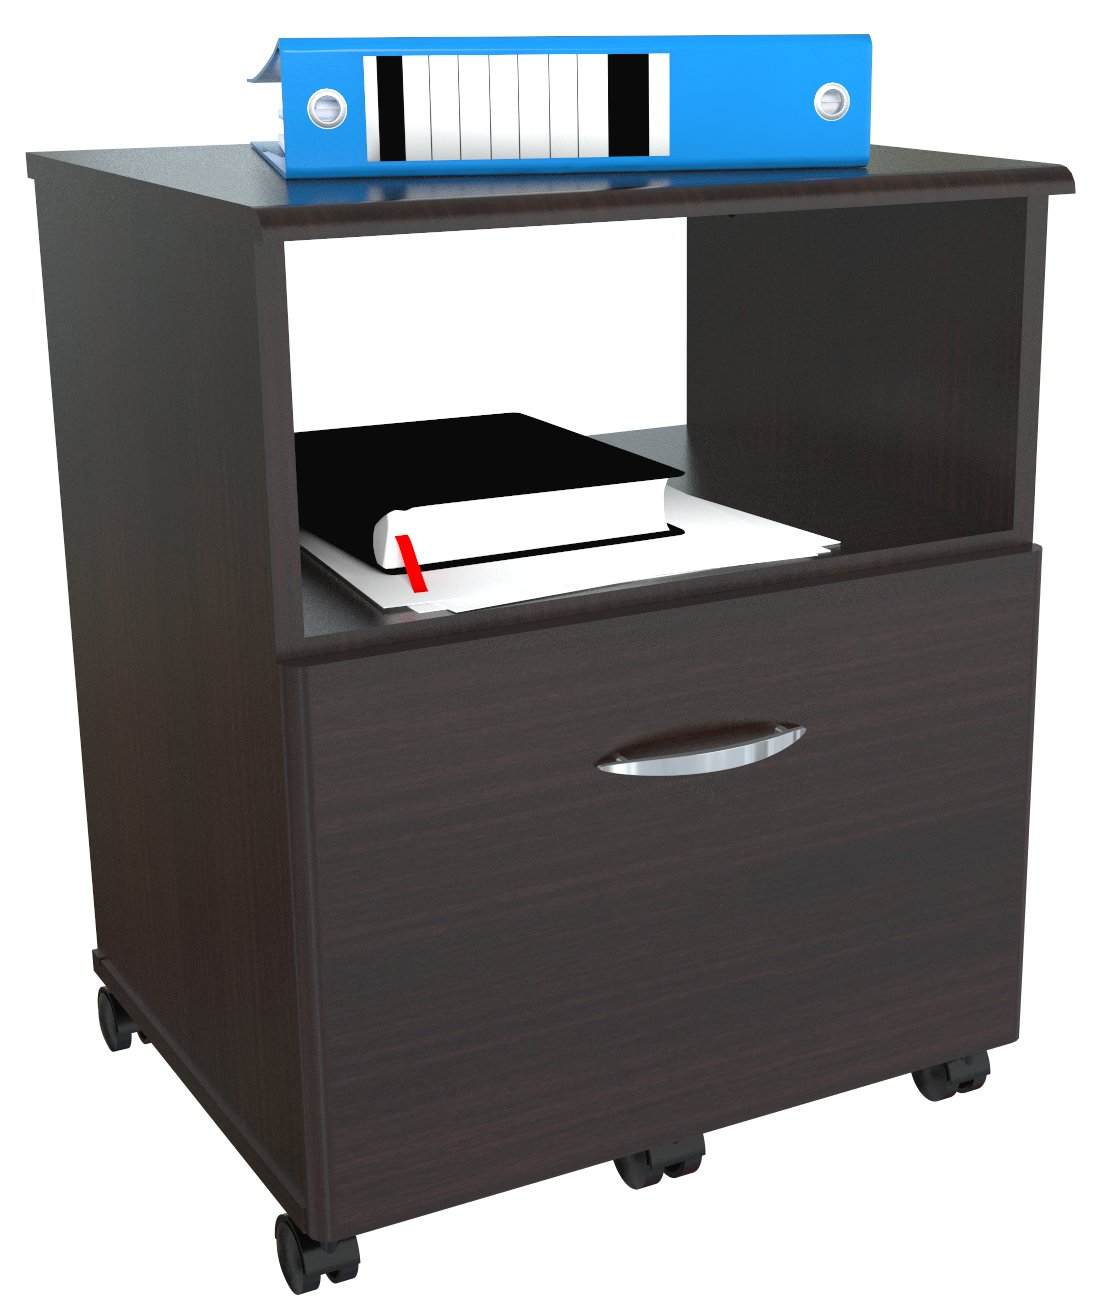 Inval AR 1LT Mobile Drawer File